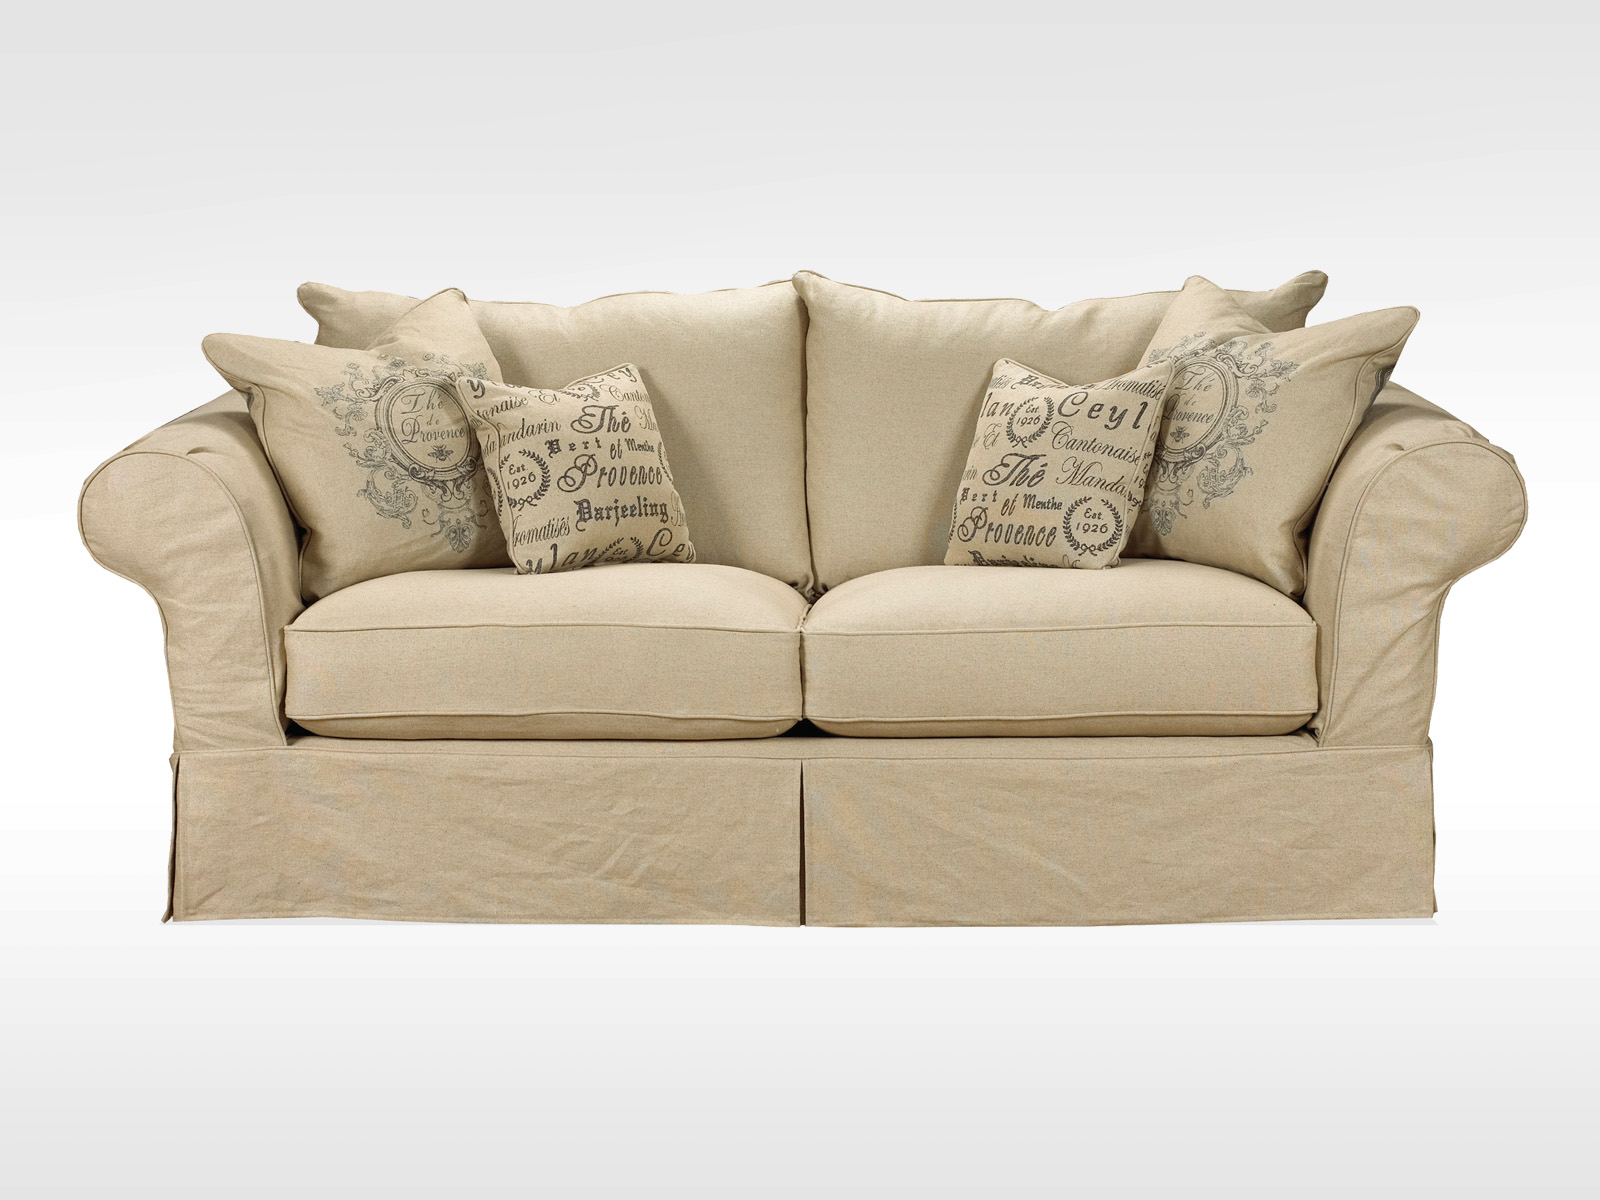 Heather Sofa - Hayward\'s - The Best Furniture St. John\'s Newfoundland